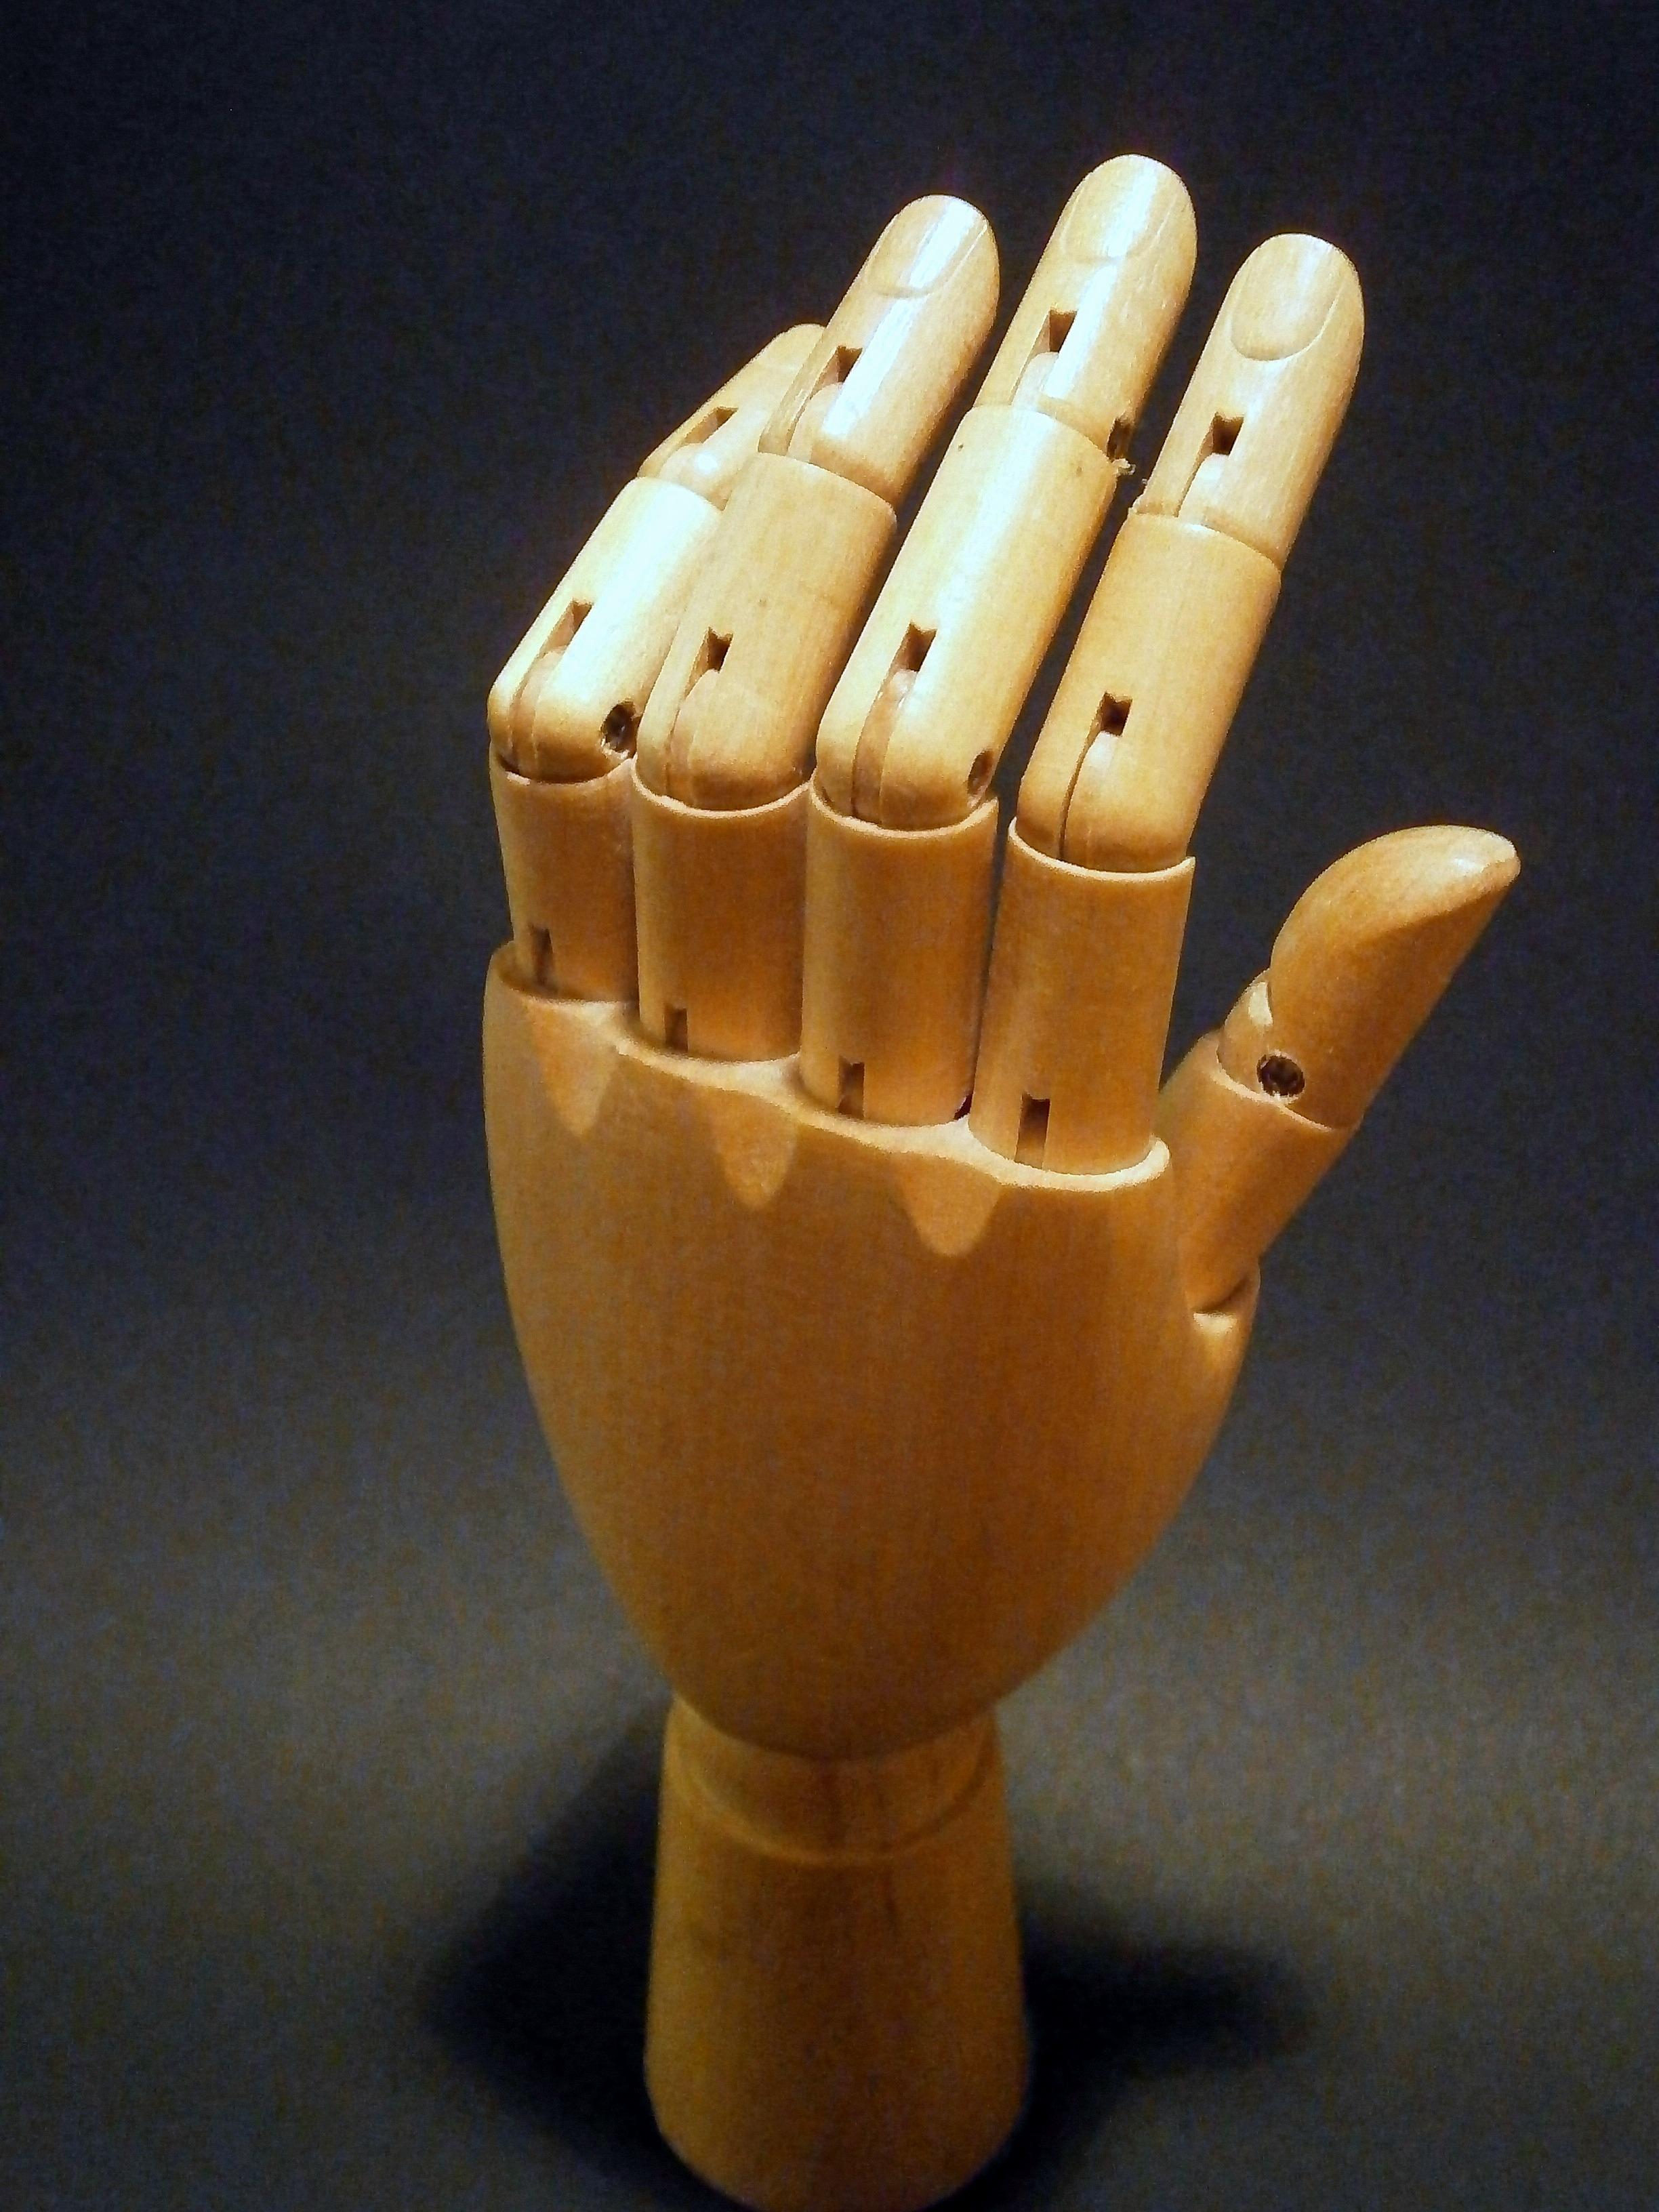 Free Images : wood, perspective, decoration, finger, ceramic, artist ...